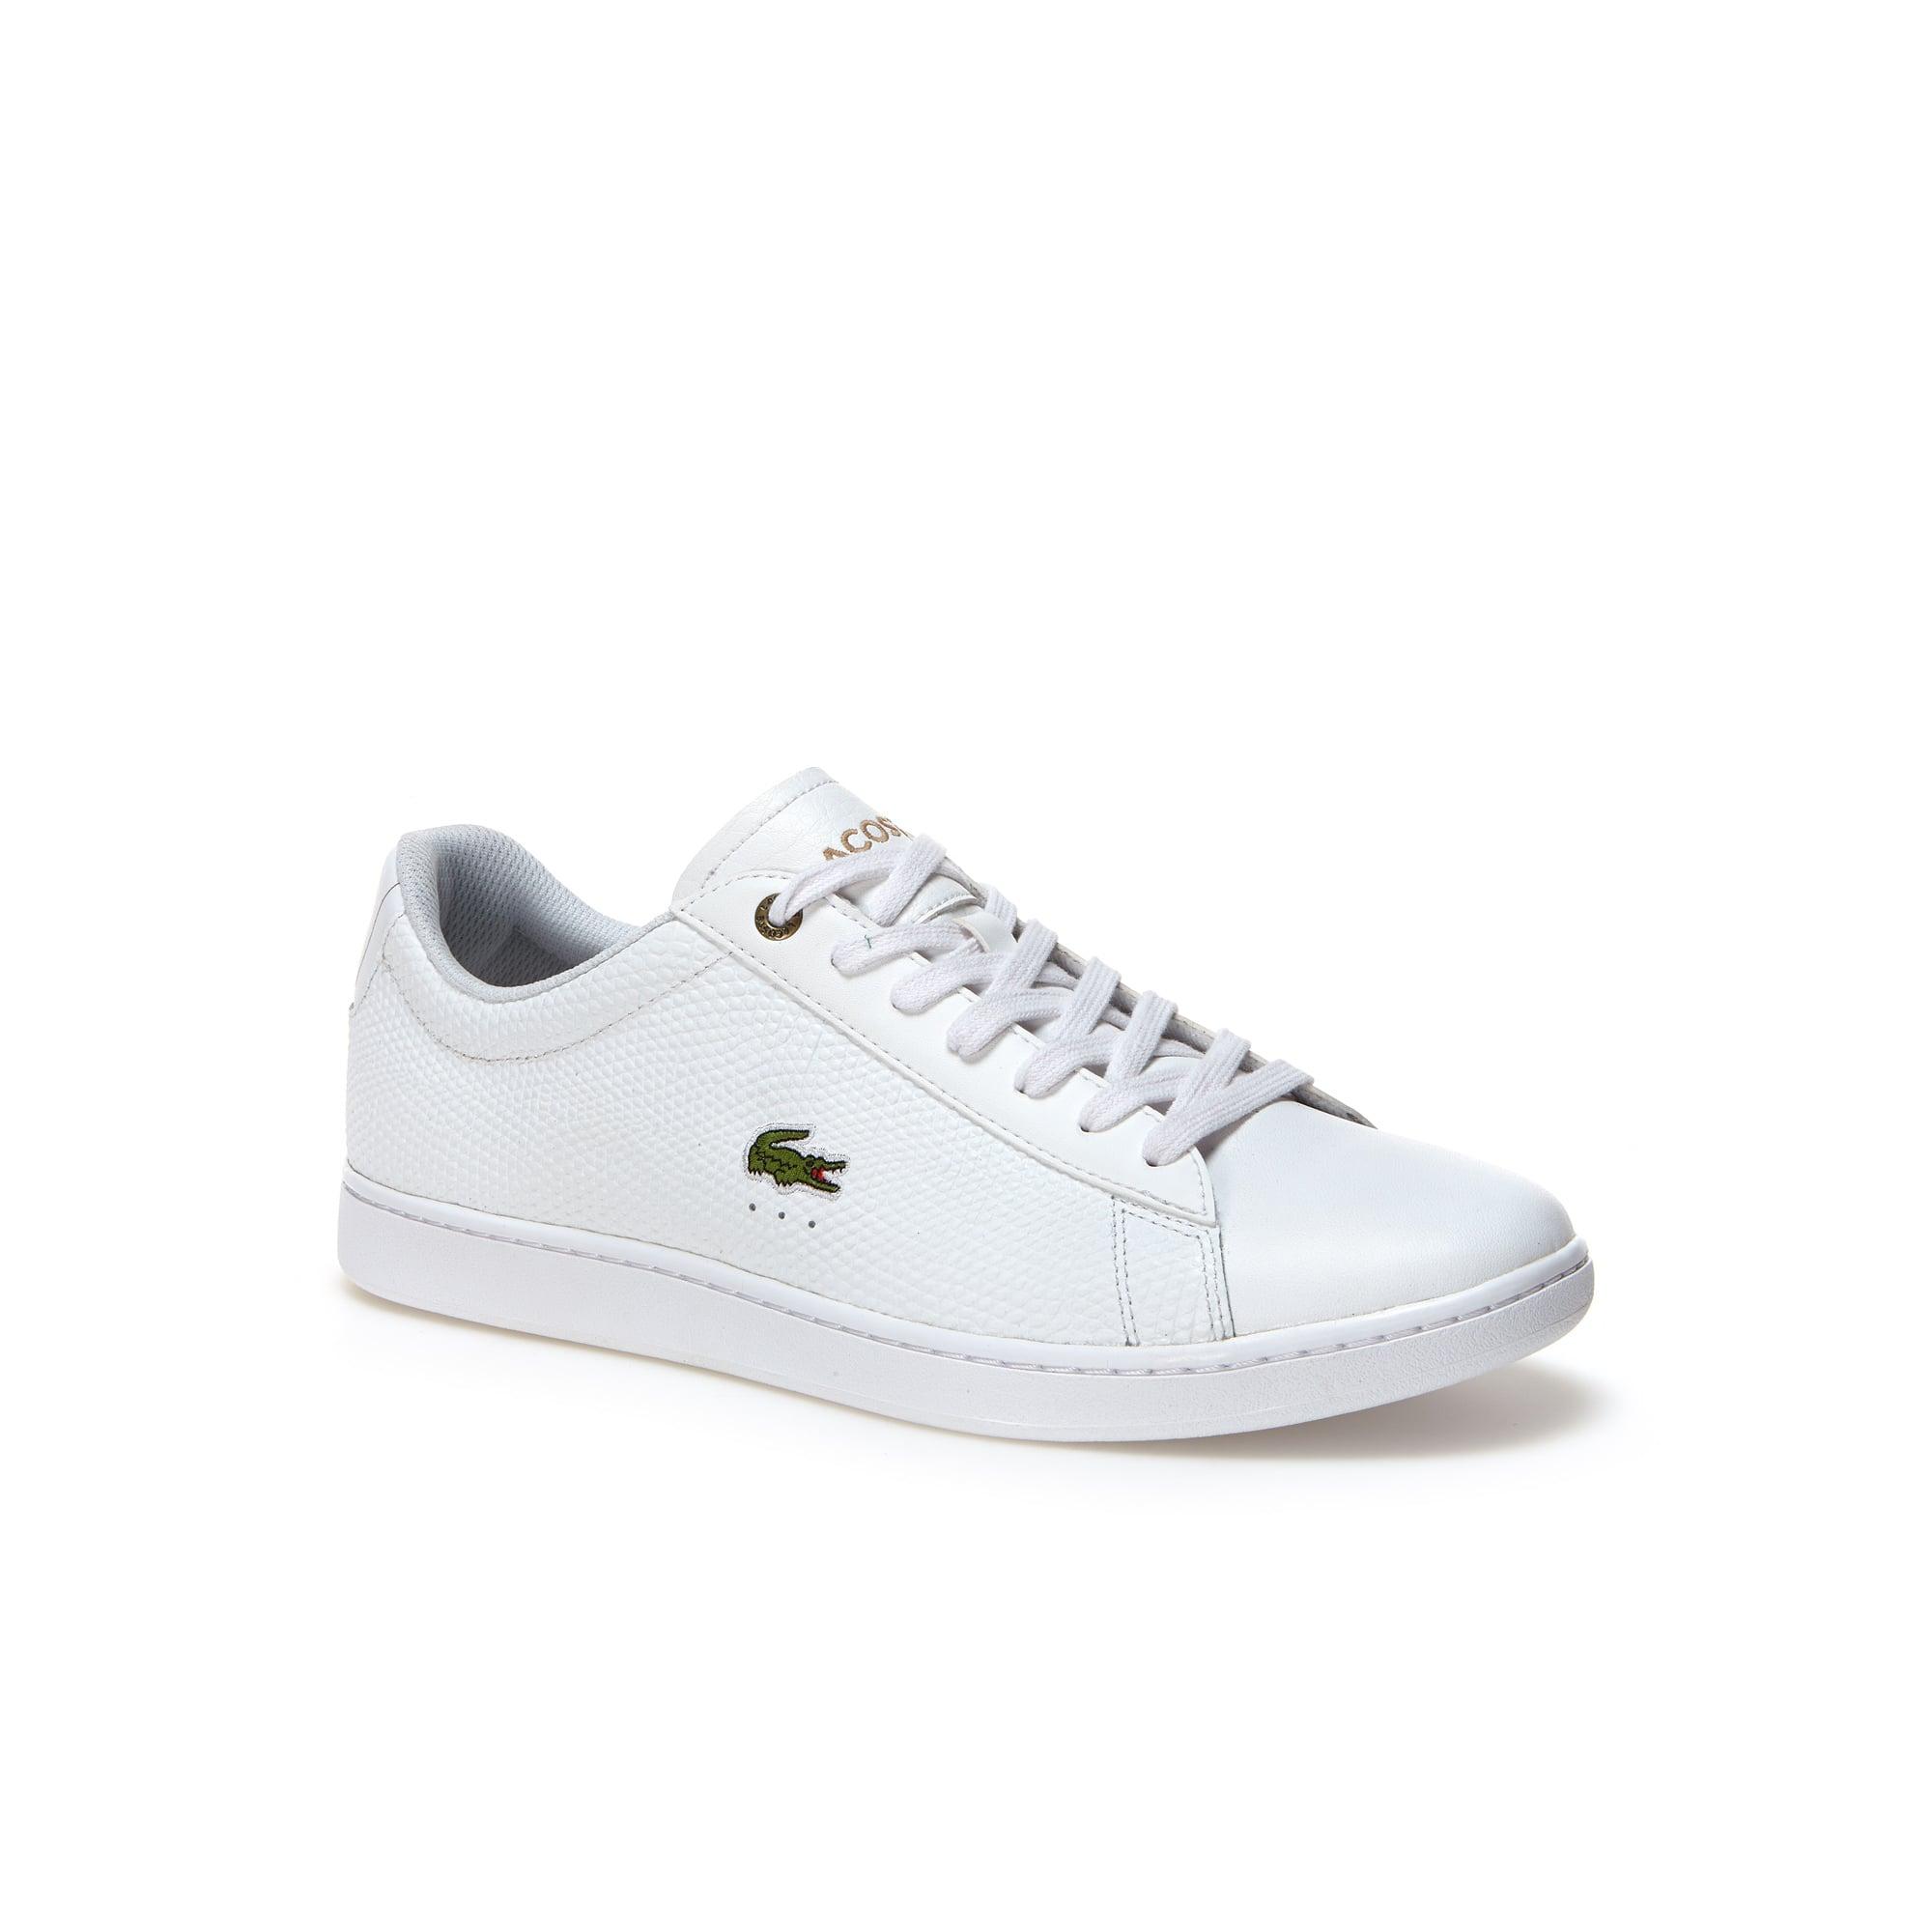 Herren-Sneakers CARNABY EVO aus Premium-Nappaleder